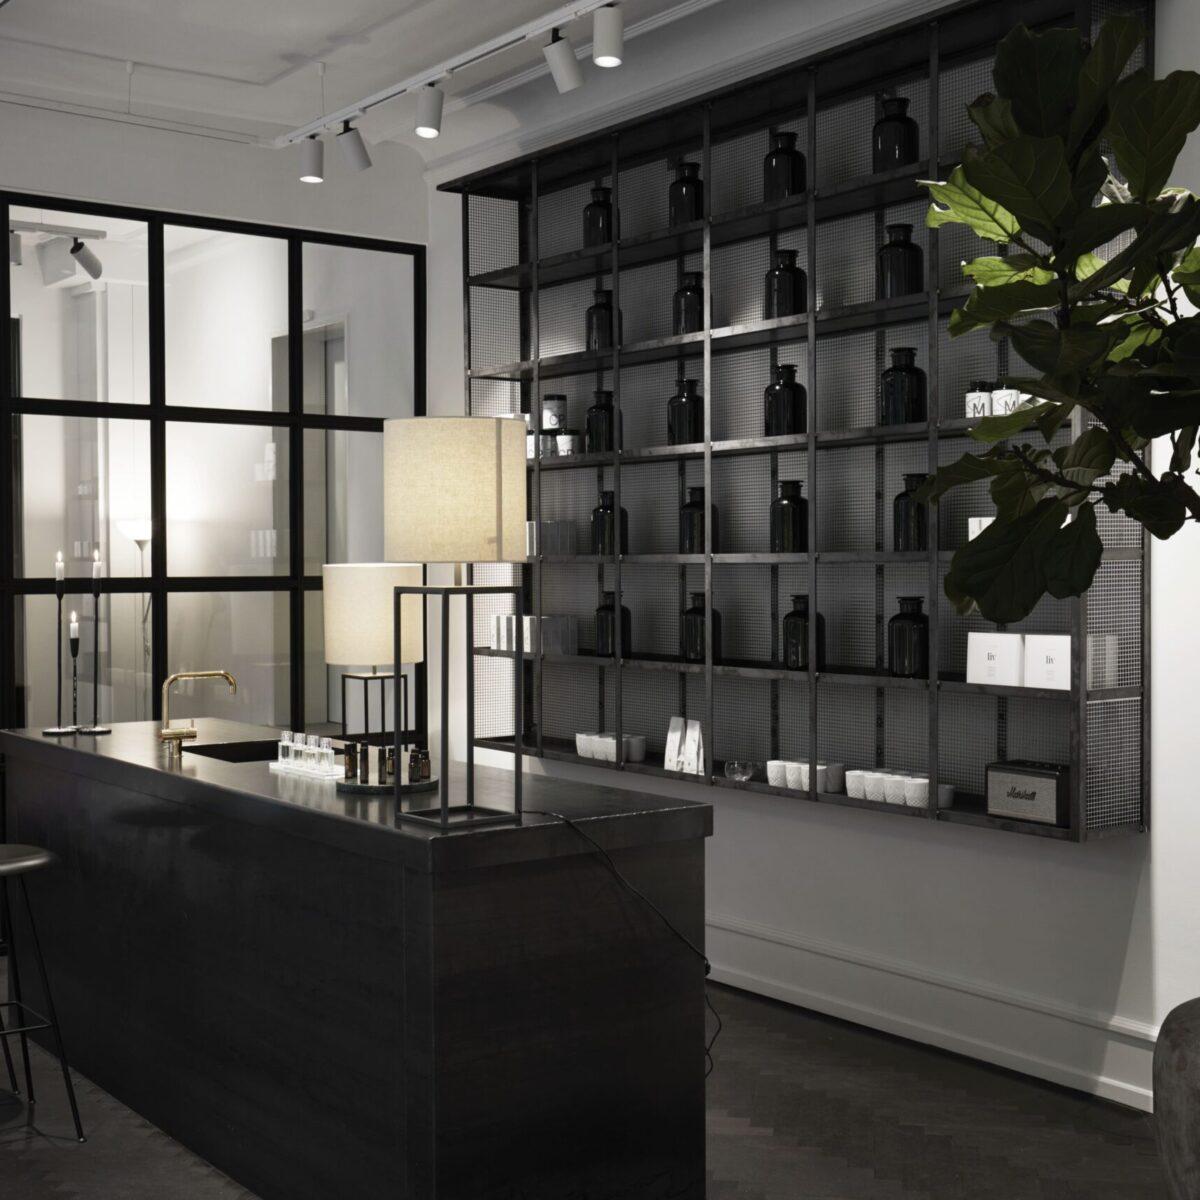 Interior of One Thirty Labs studio